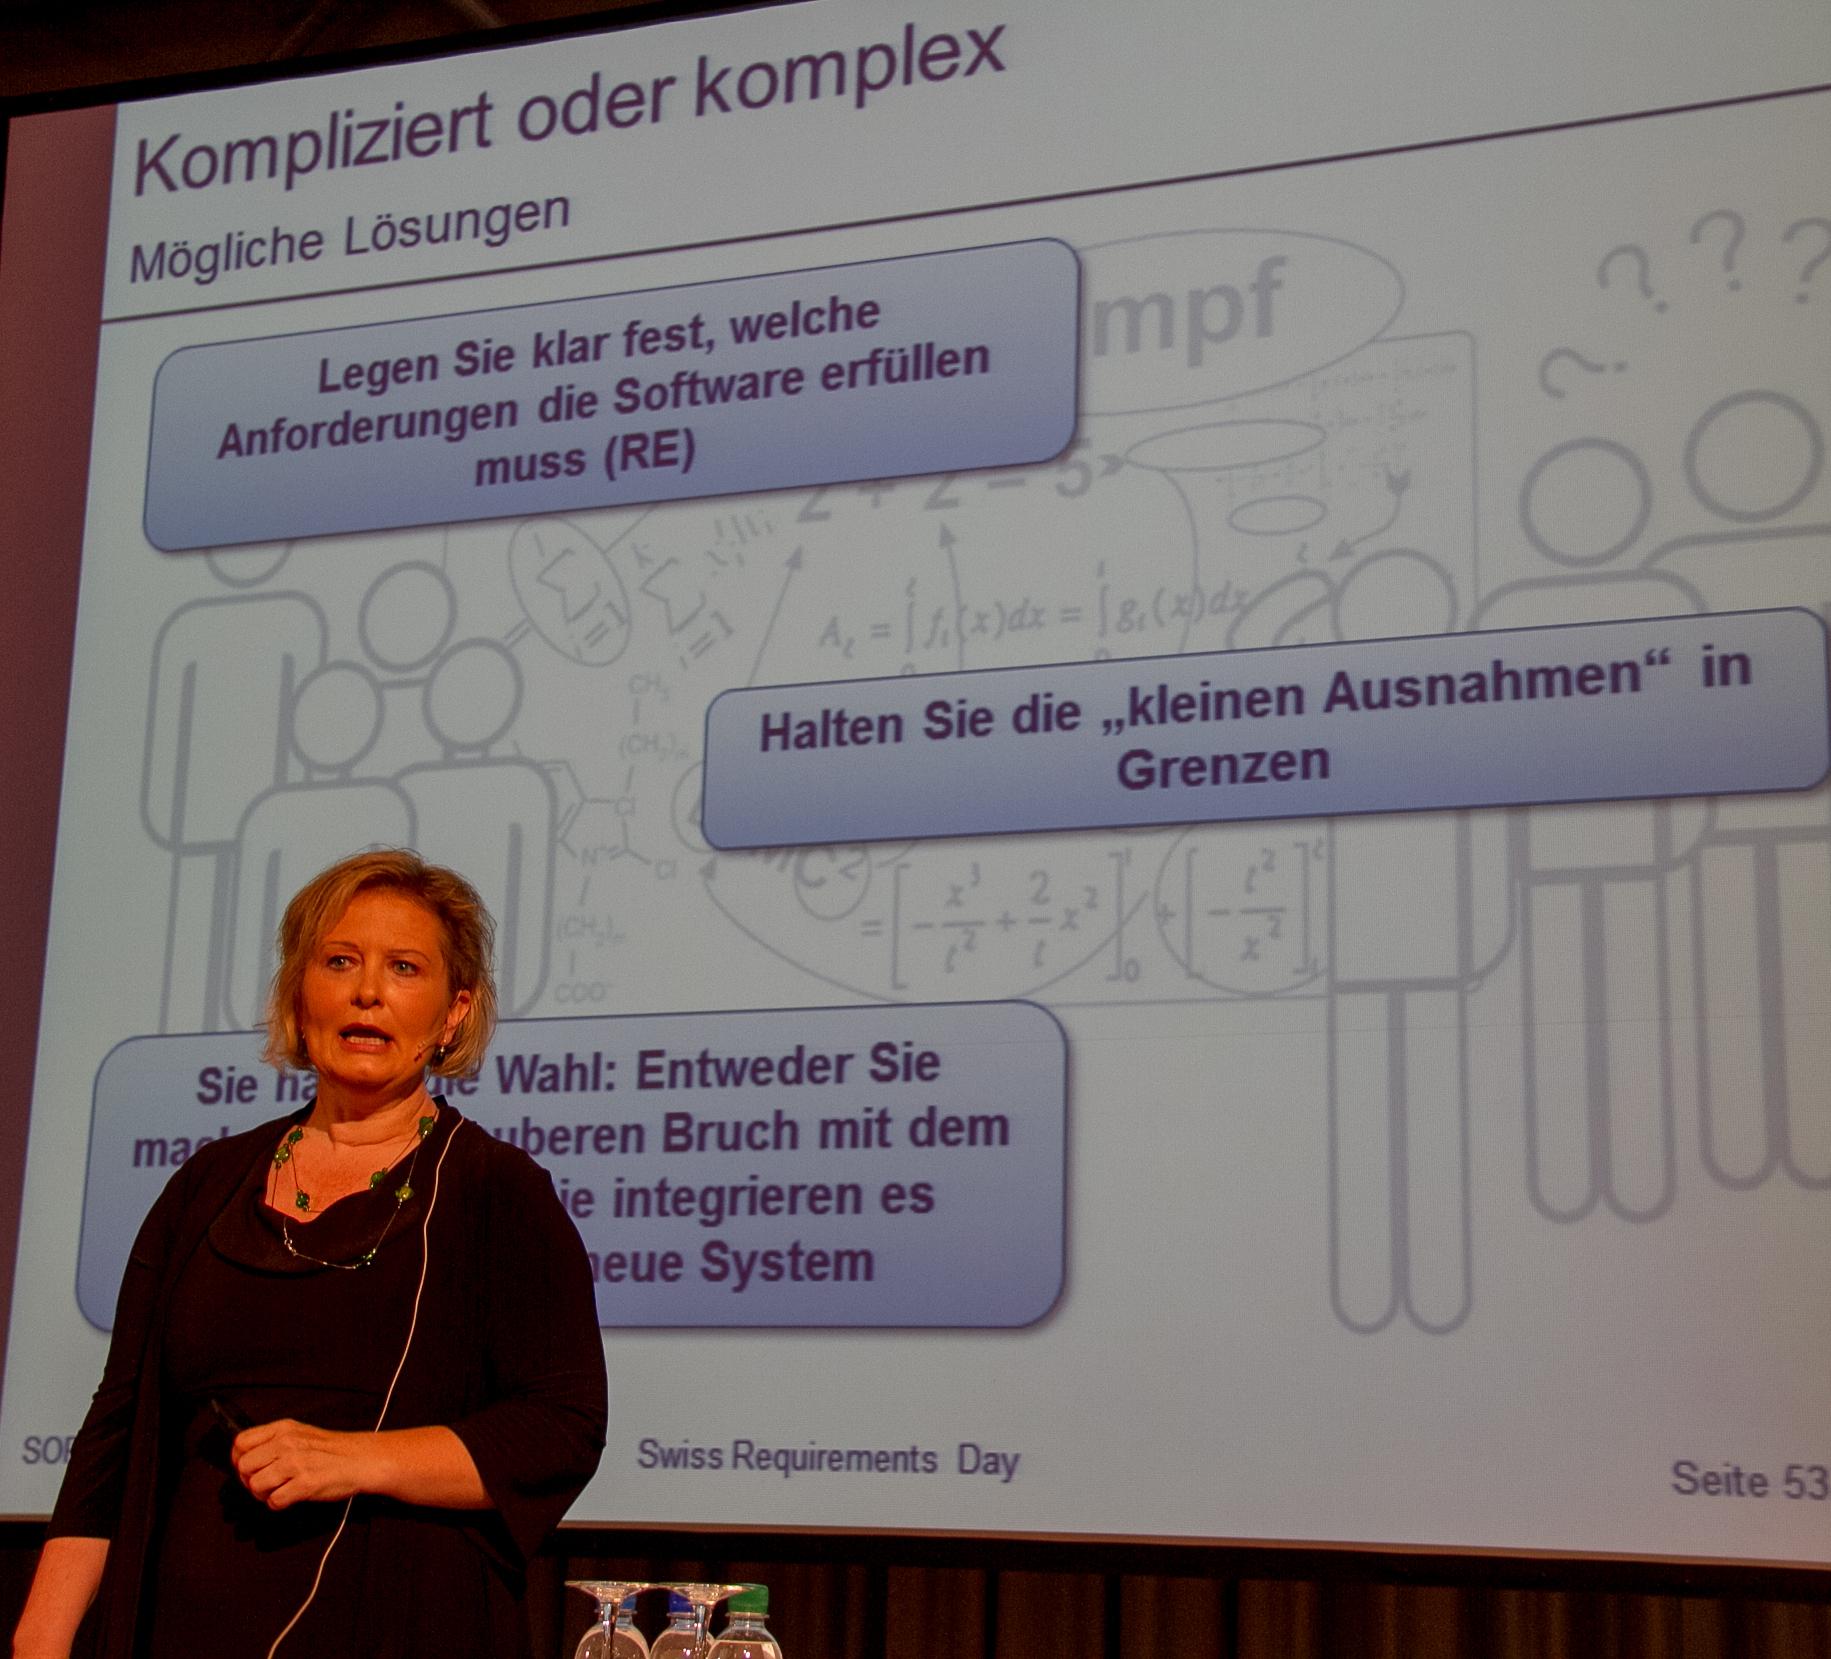 Chris Rupp: Loesungen bei zu komplizierten oder komplexen IT-Projekten (Vortrag-Slides)